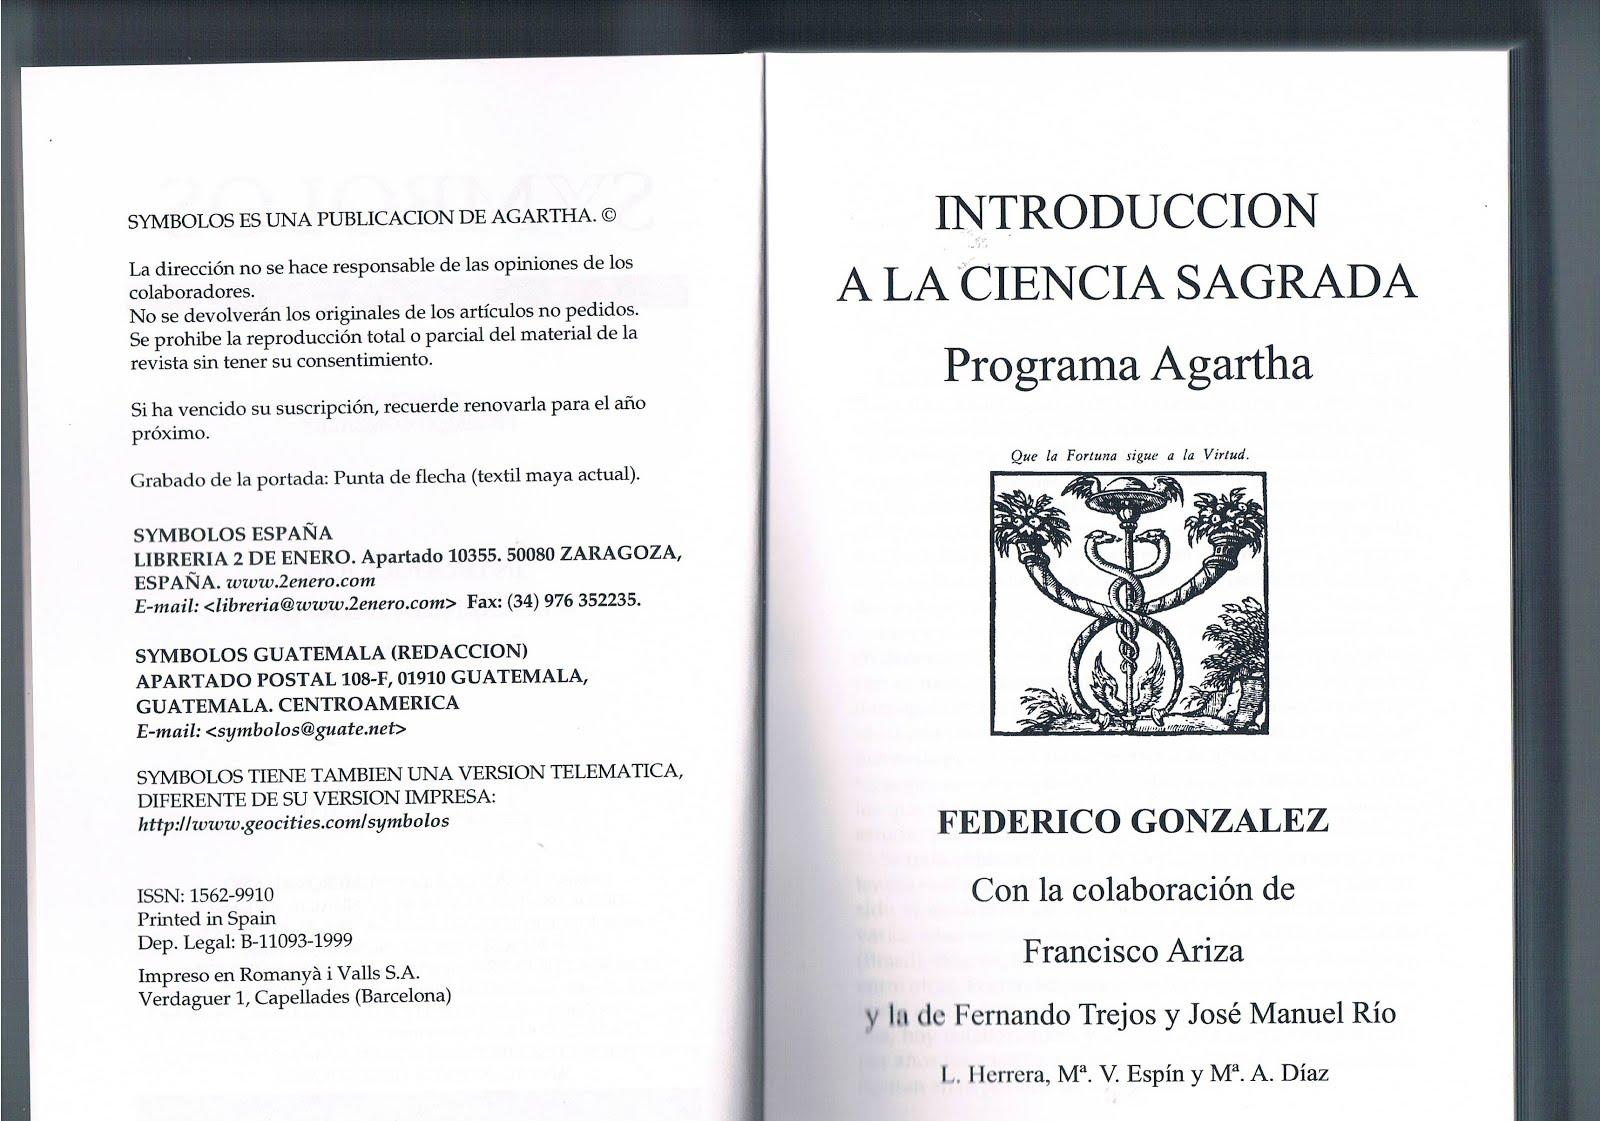 Programa Agartha